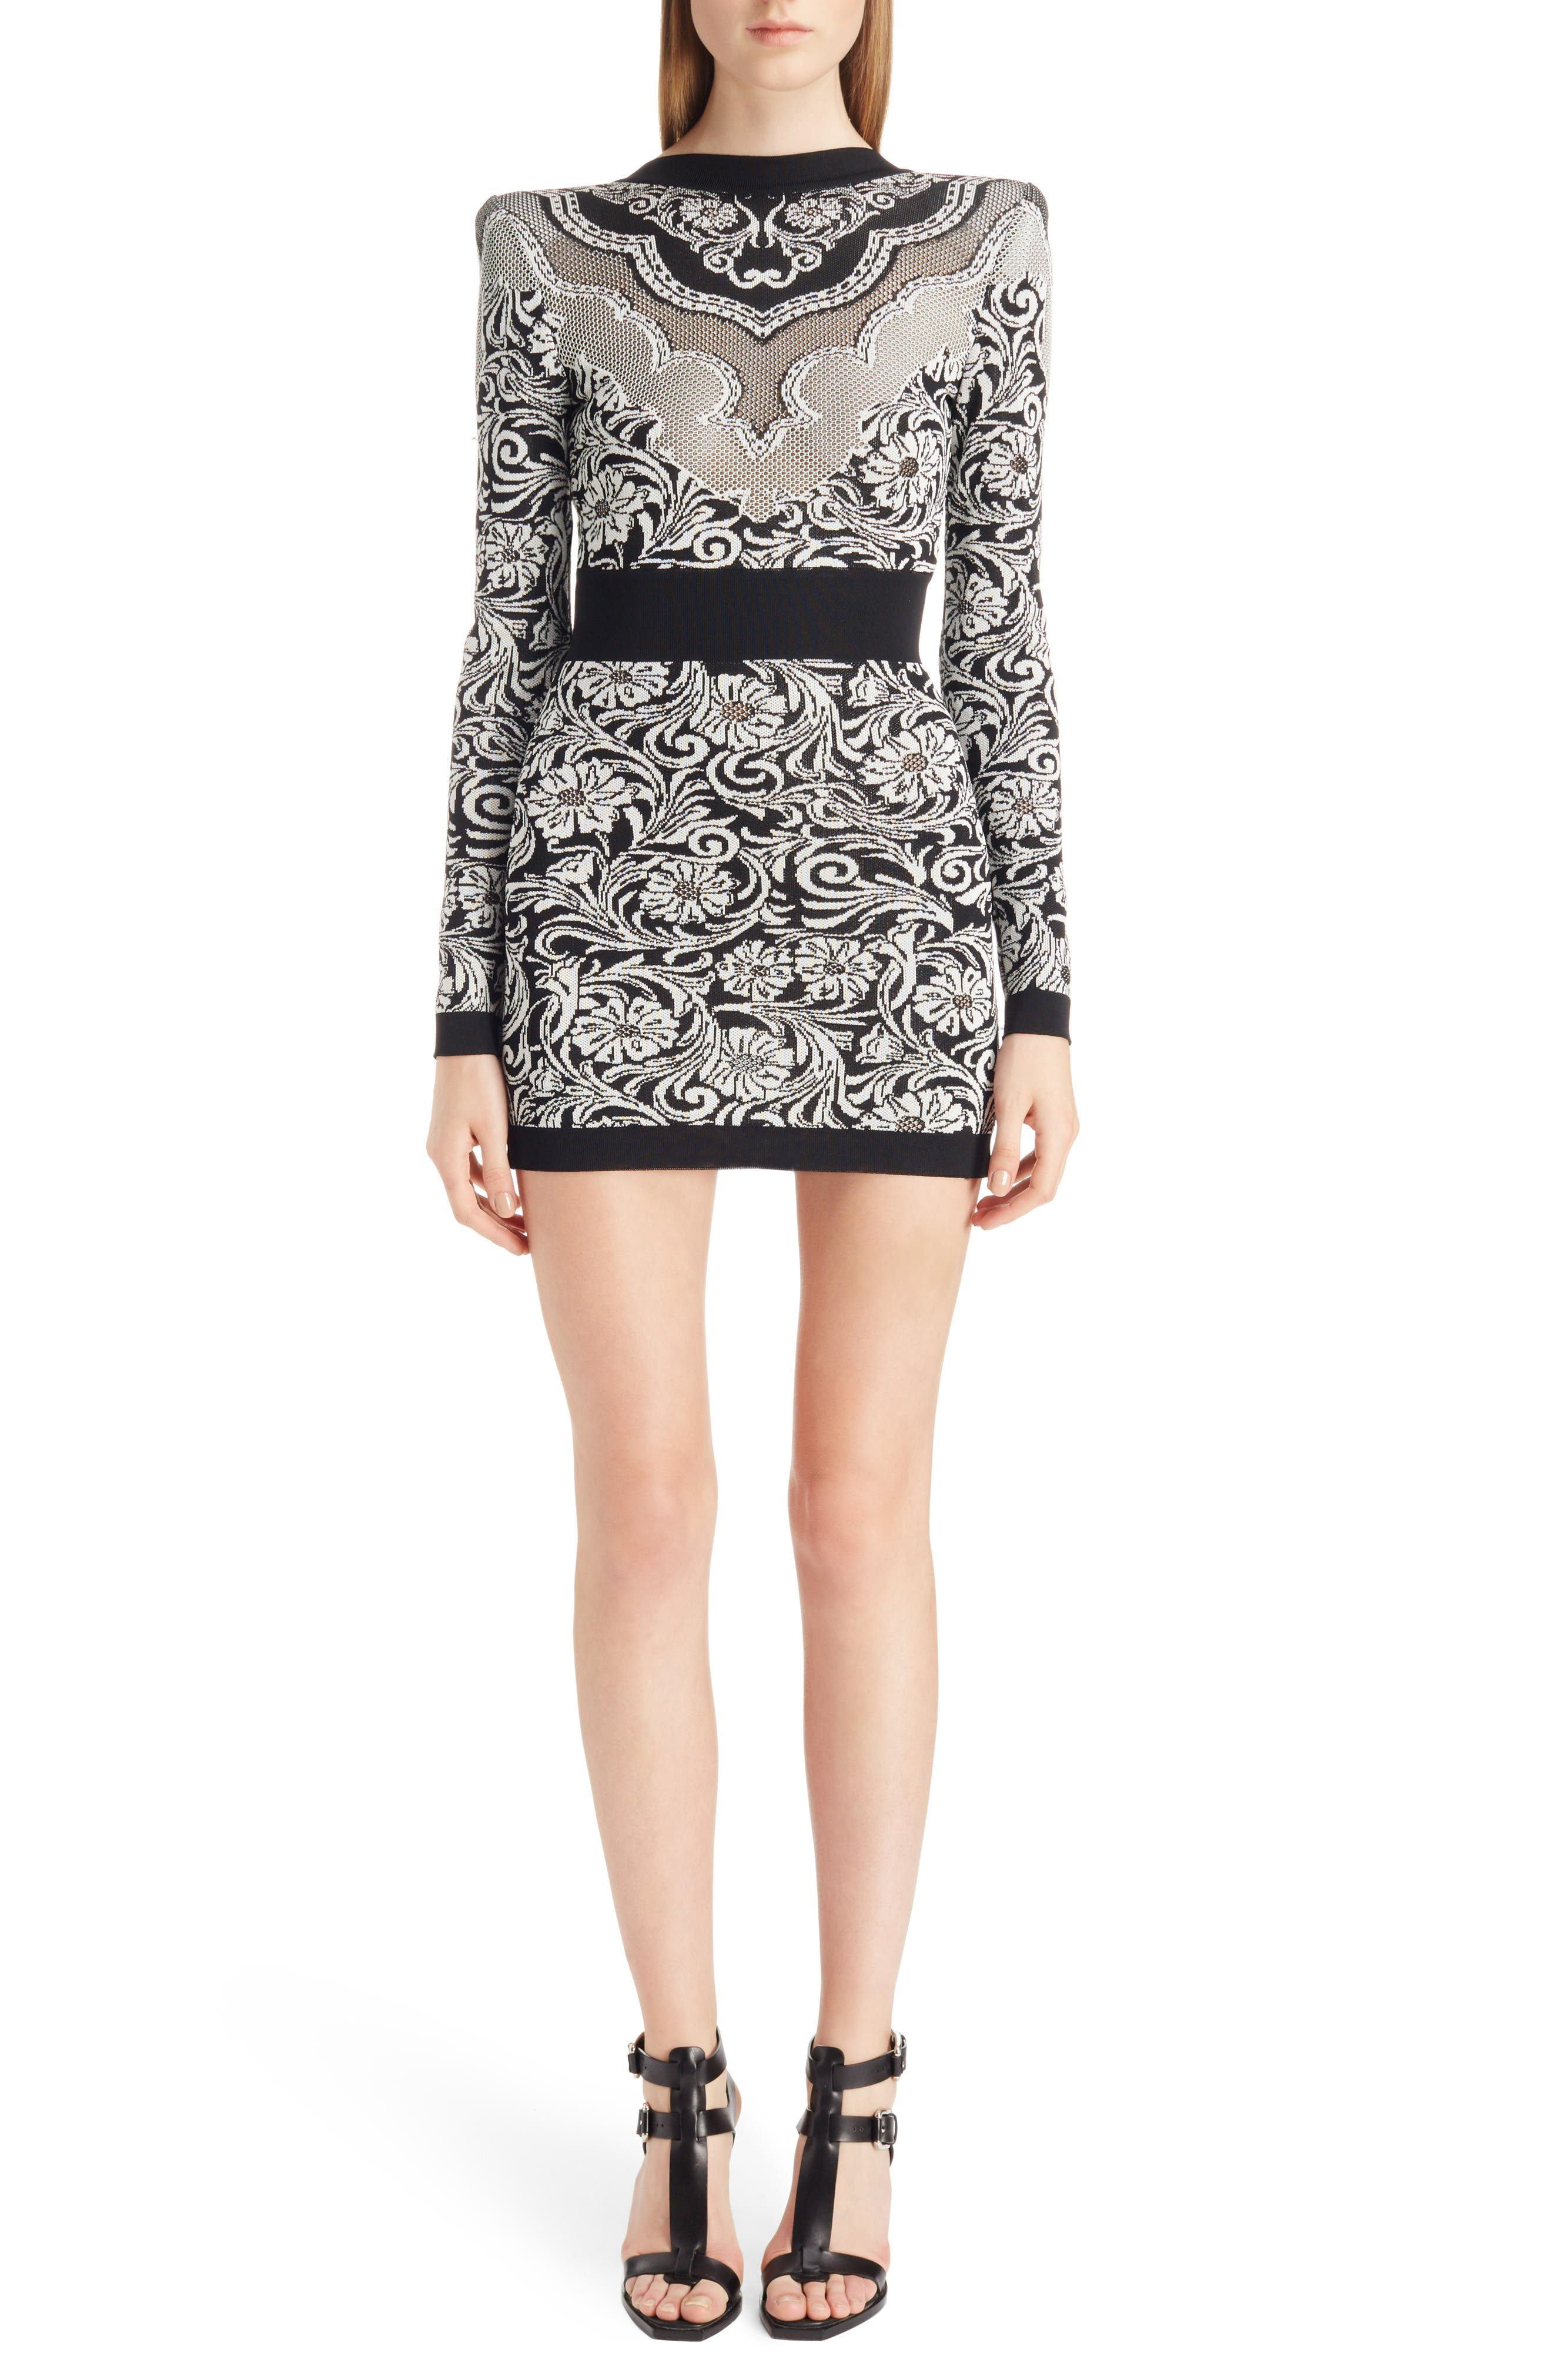 Baroque Knit Minidress,                             Main thumbnail 1, color,                             Black And White